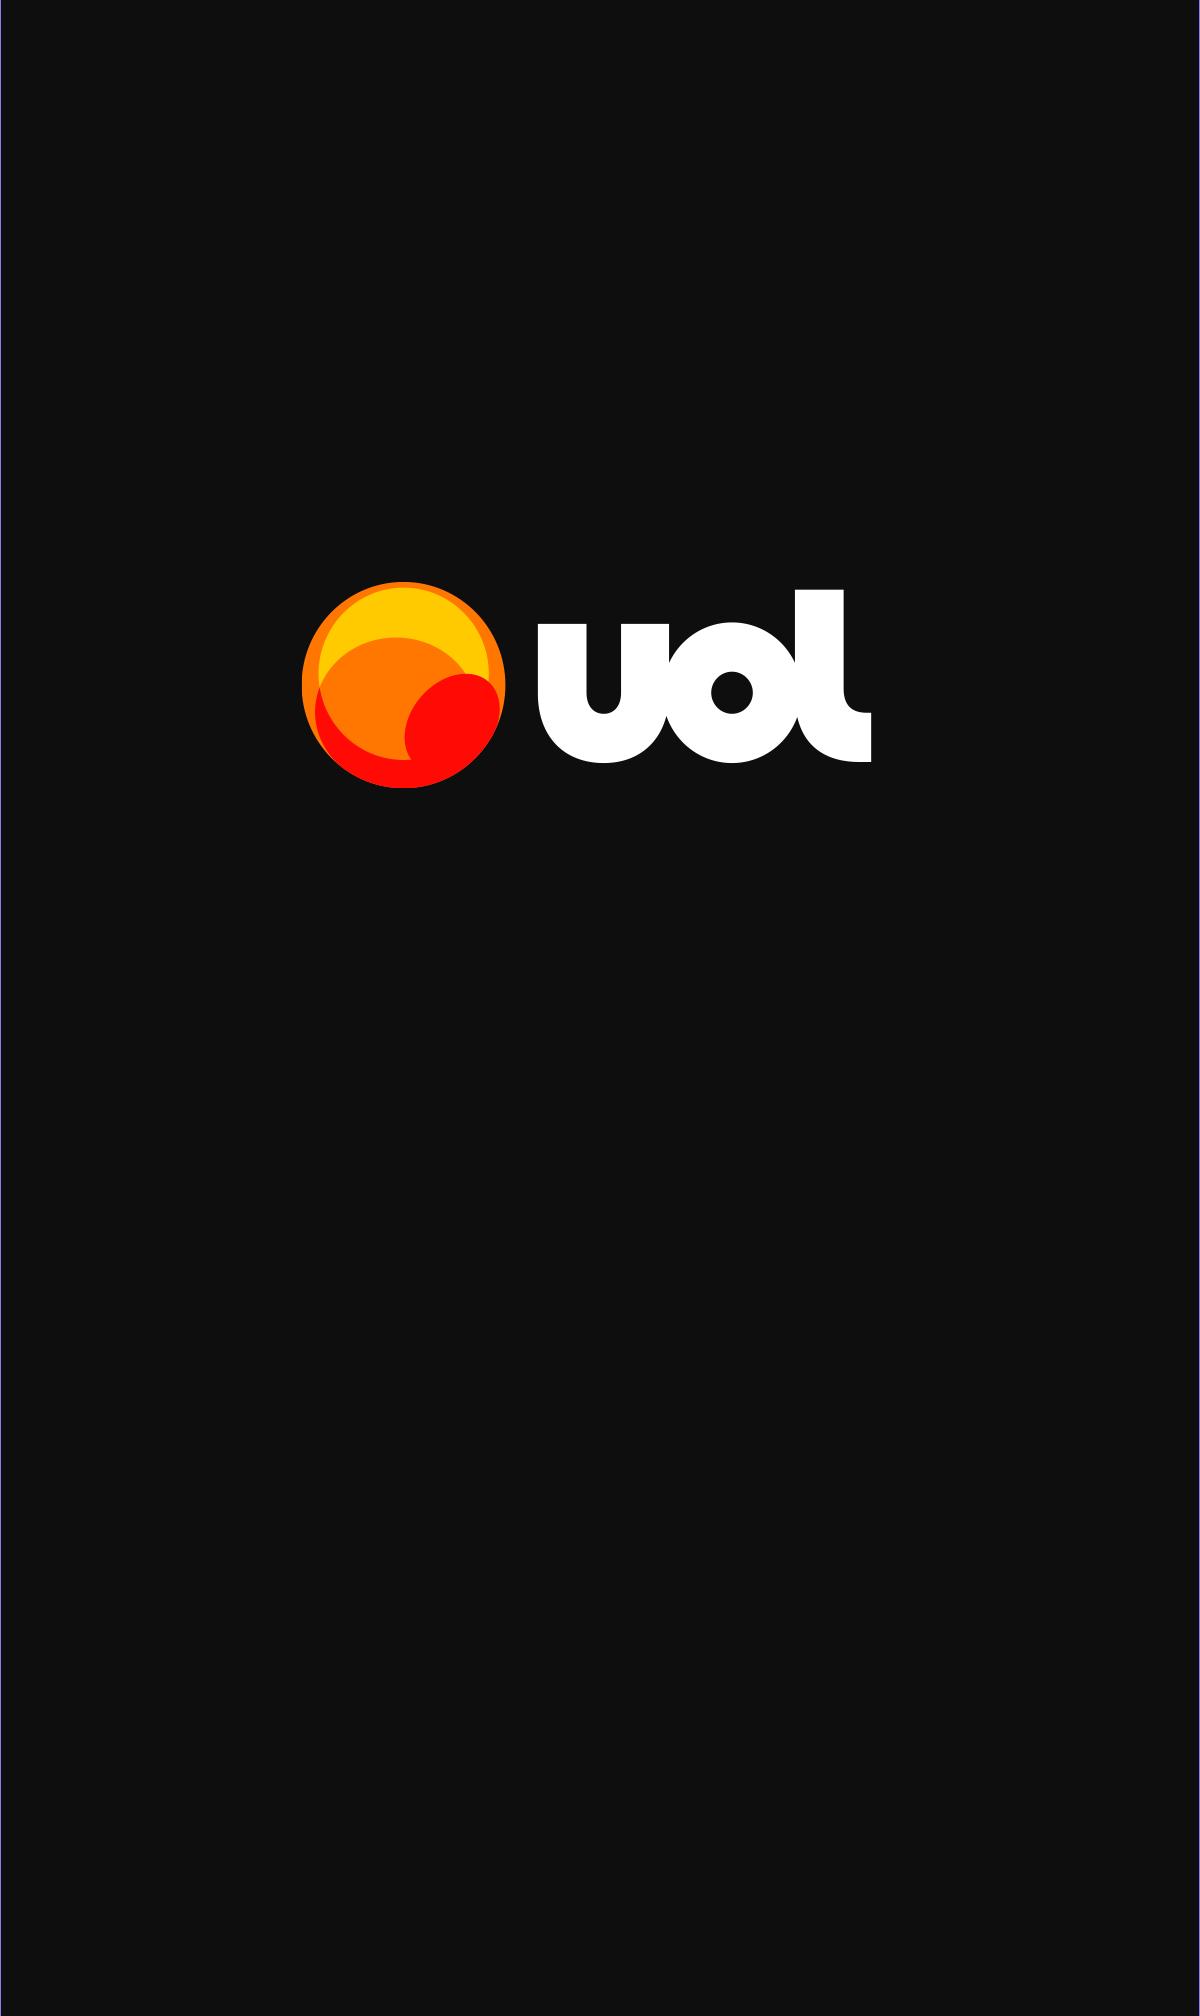 logos_uol_cs2